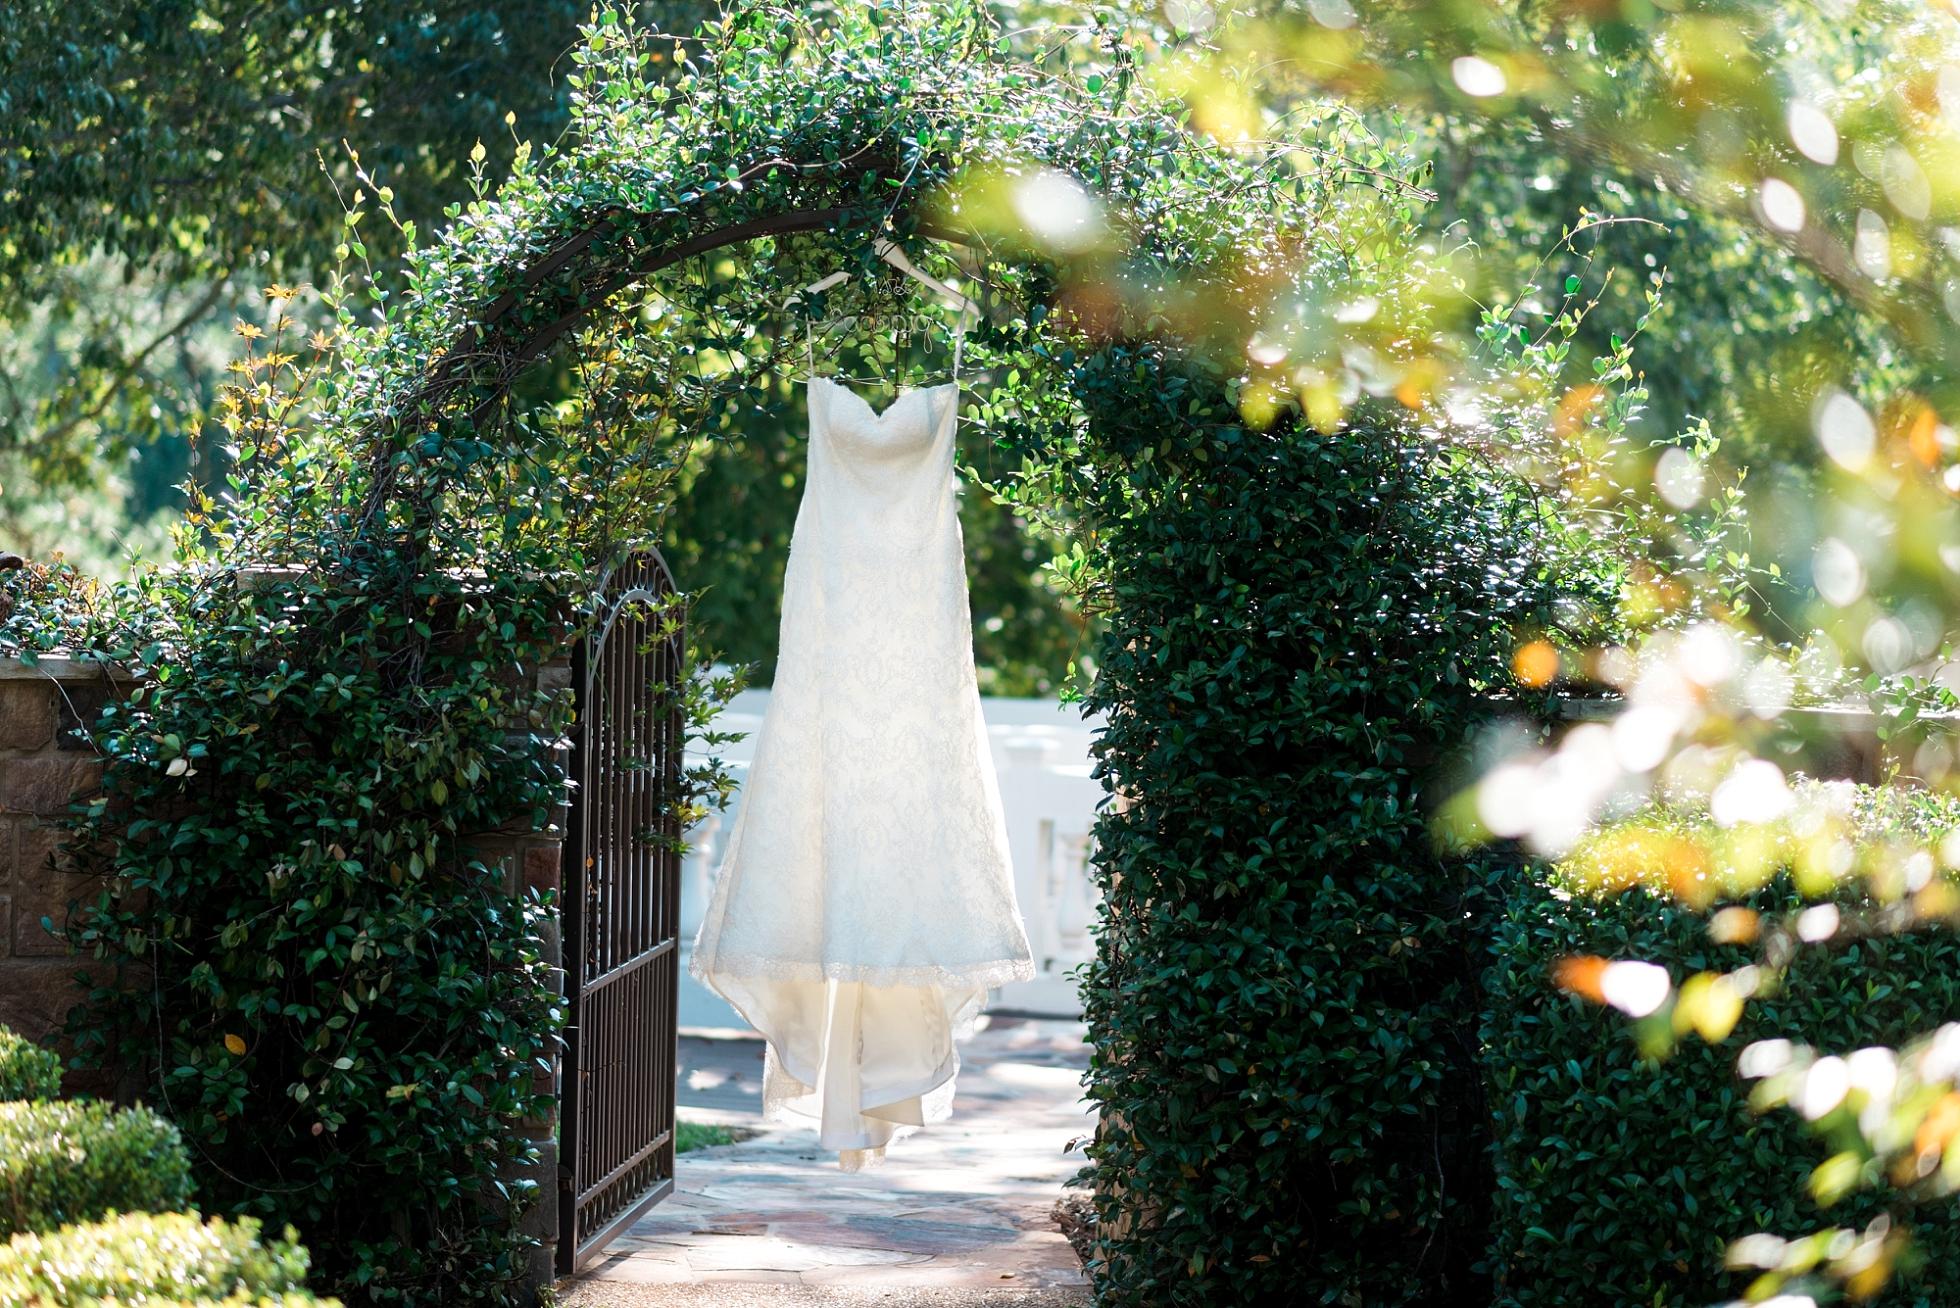 Wedding Dress - Bridals by Lori - Kyle & Erin | Scarbrough Wedding | Children's Harbor | Laura Wilkerson Photography